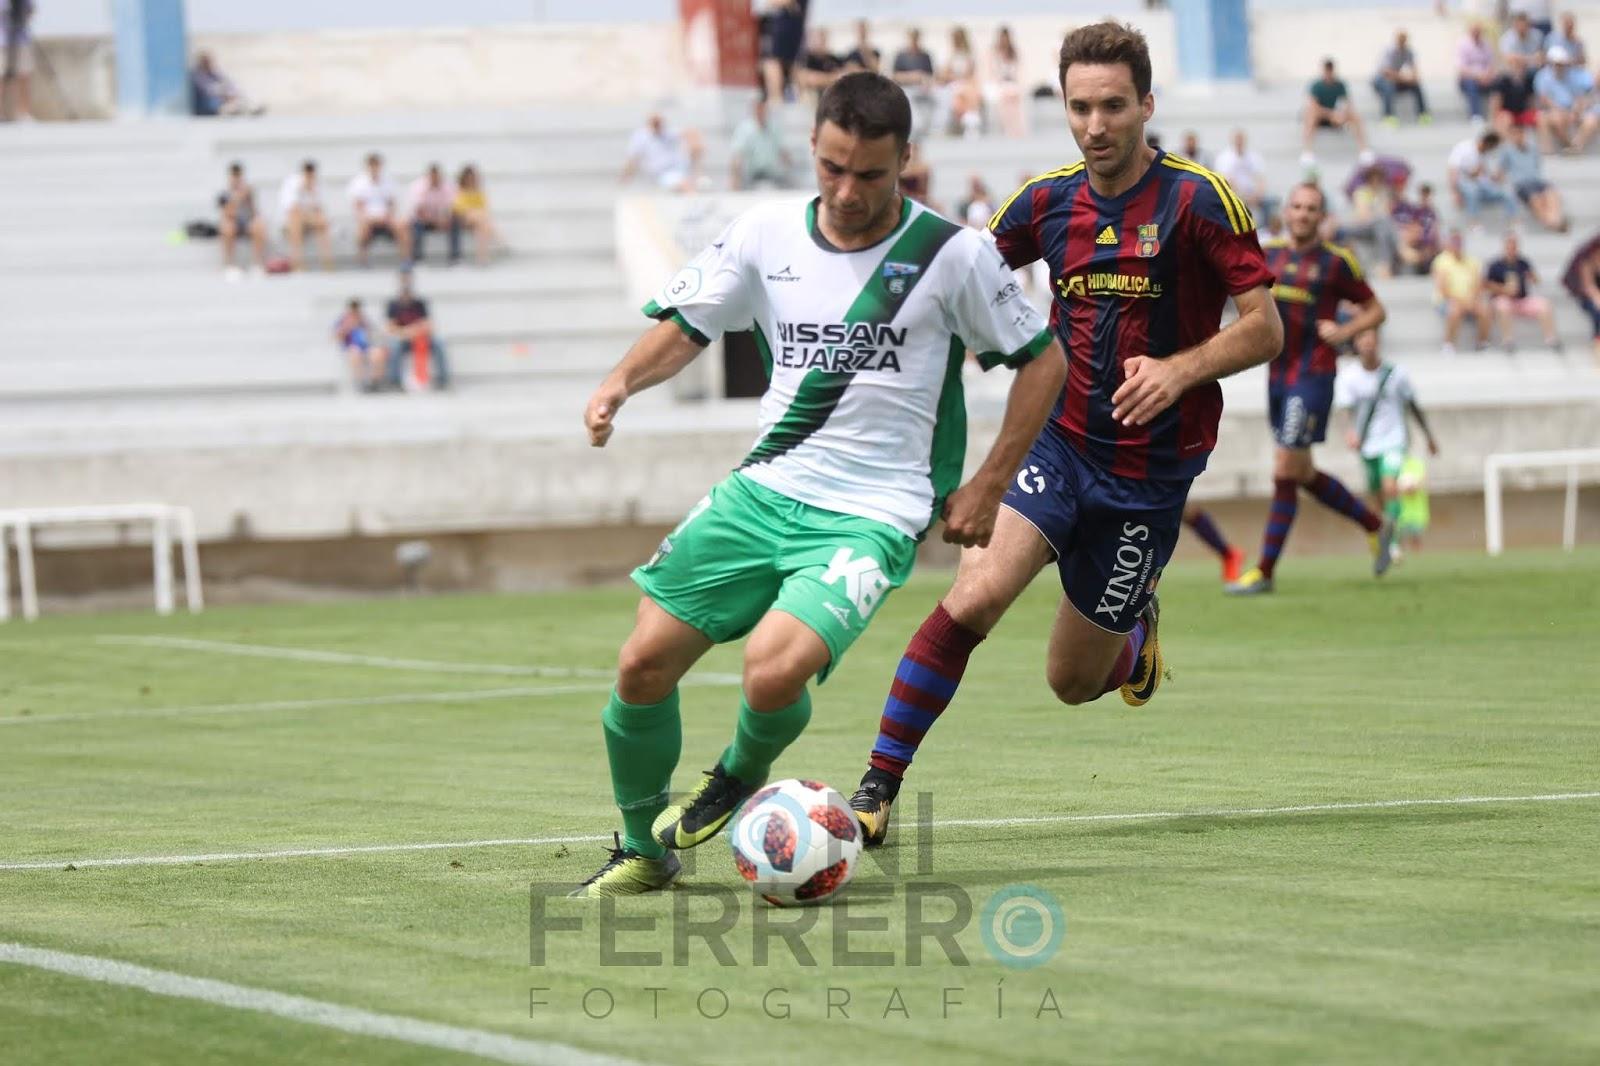 Resumen Play-offs Tercera División, segunda ronda, ida: De cara